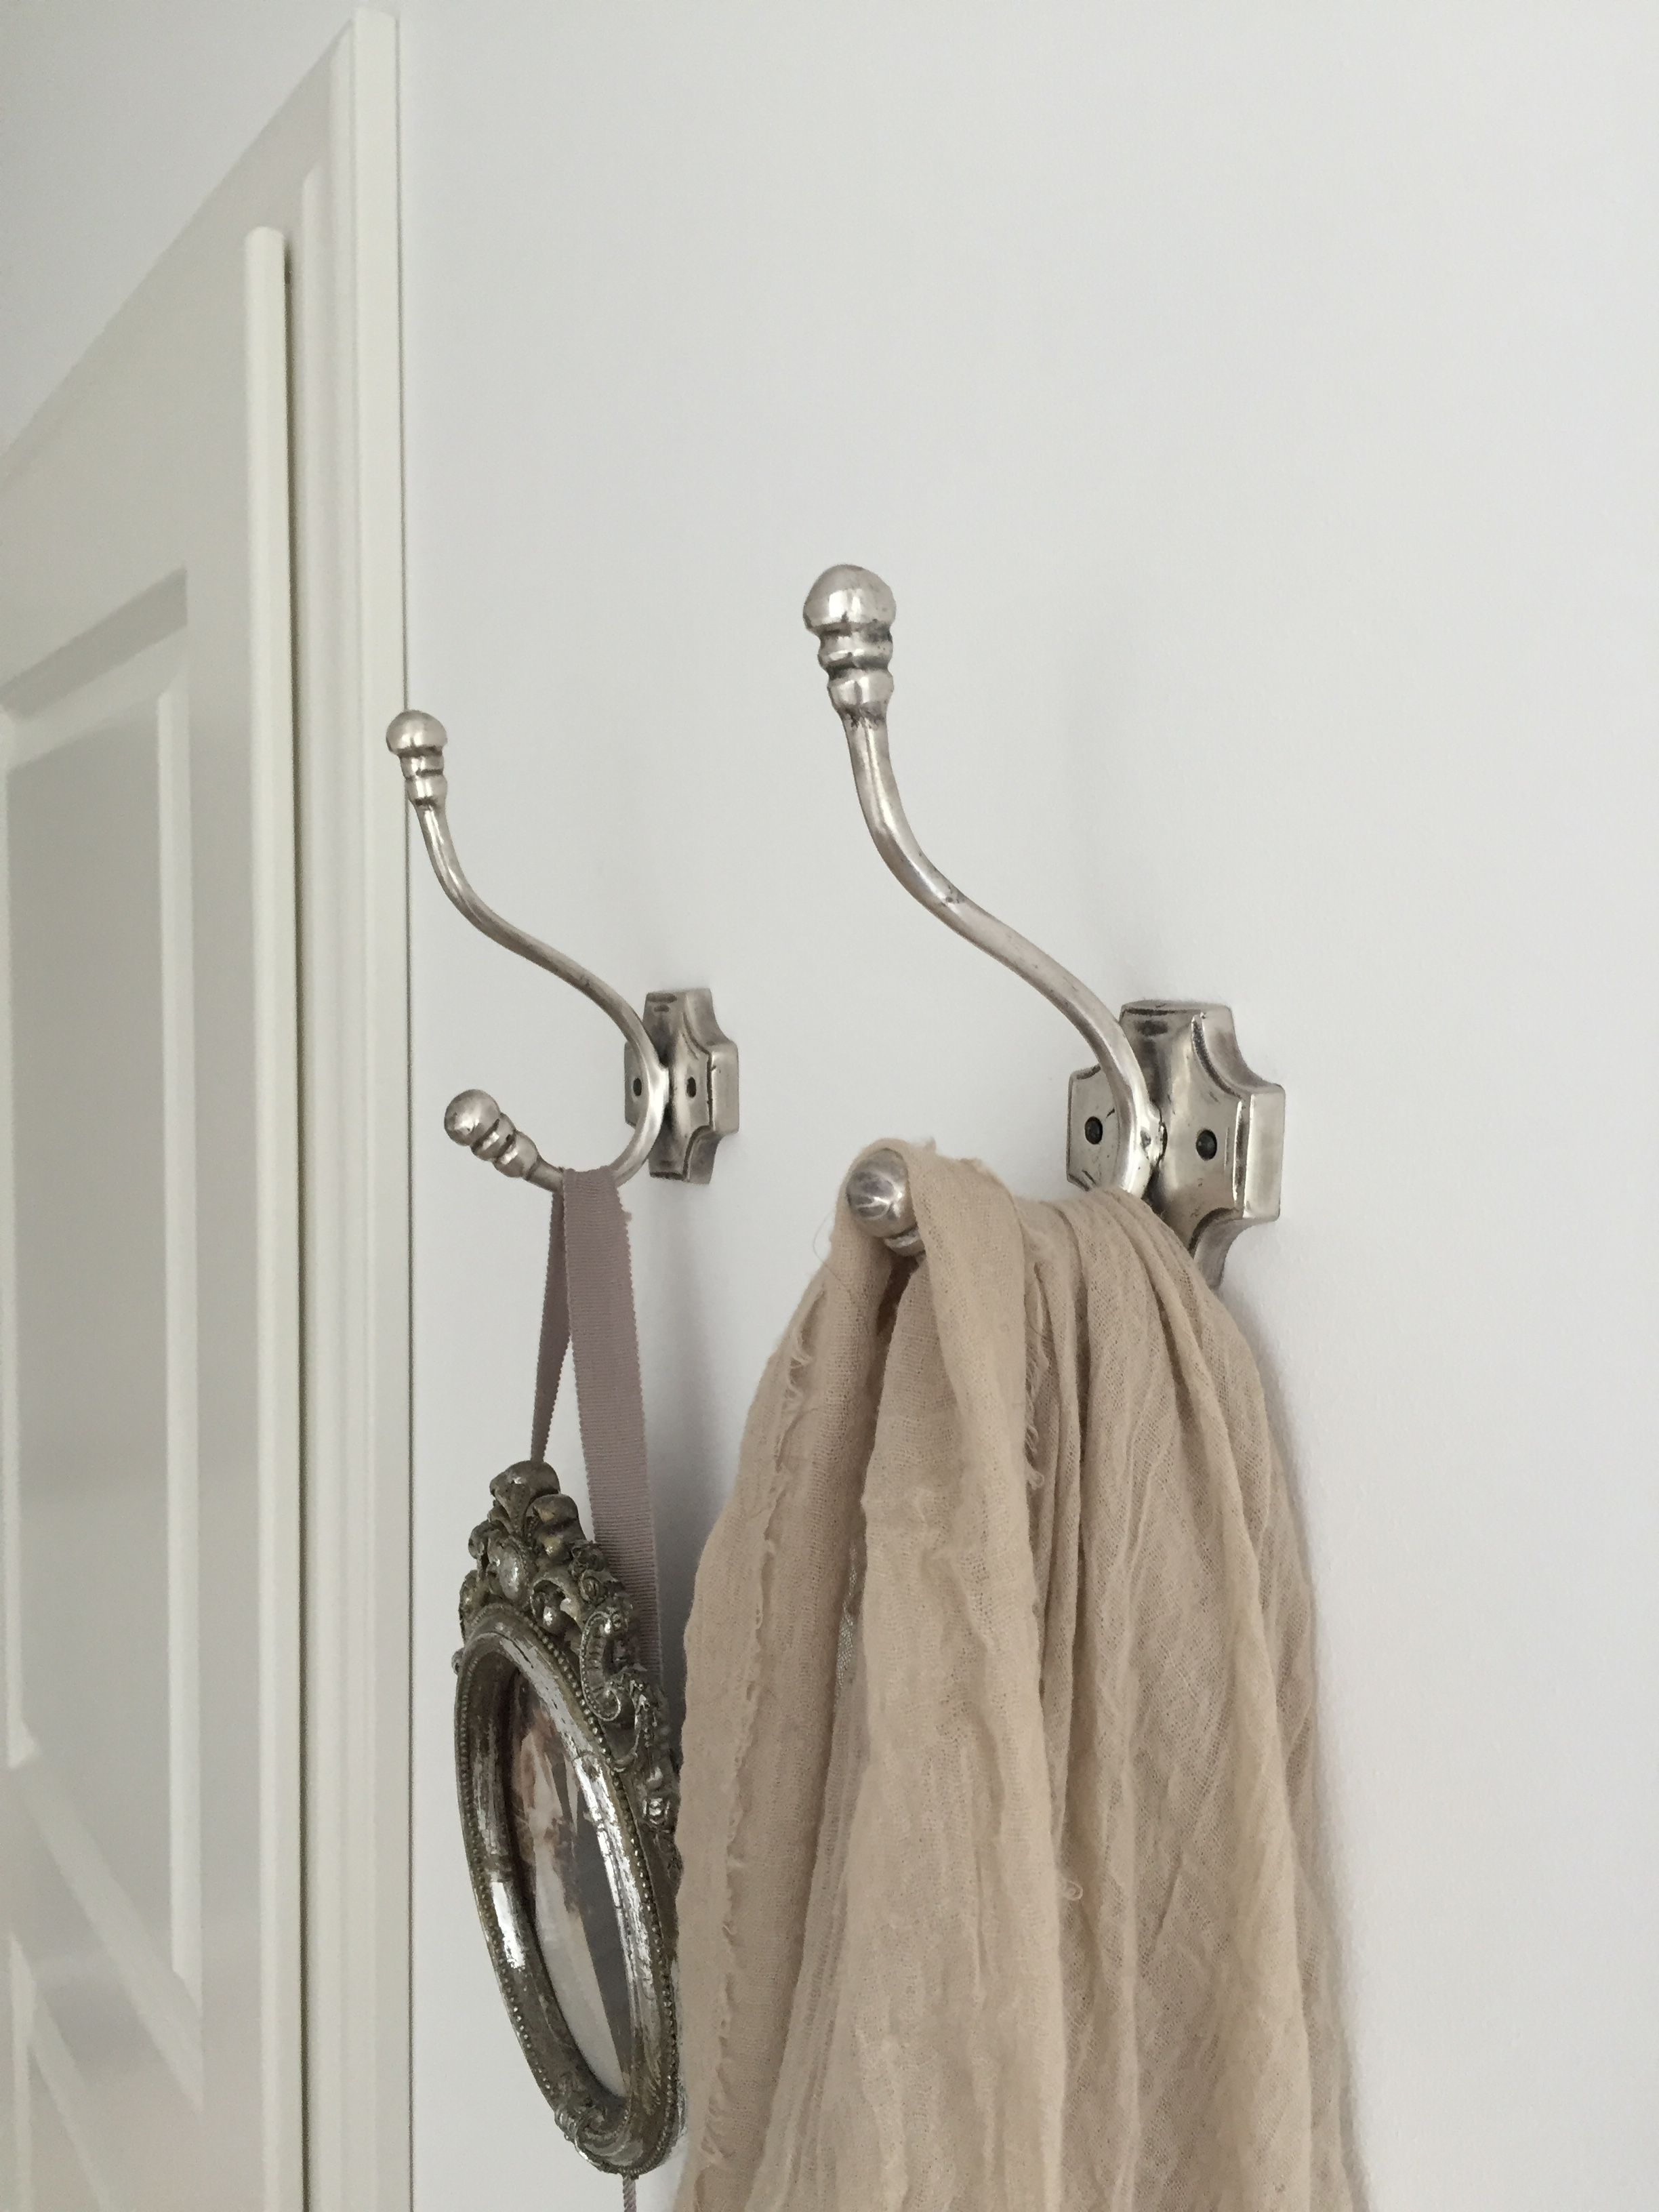 garderoben haken silber 14 95 strandhaus living by ambiente at home in. Black Bedroom Furniture Sets. Home Design Ideas